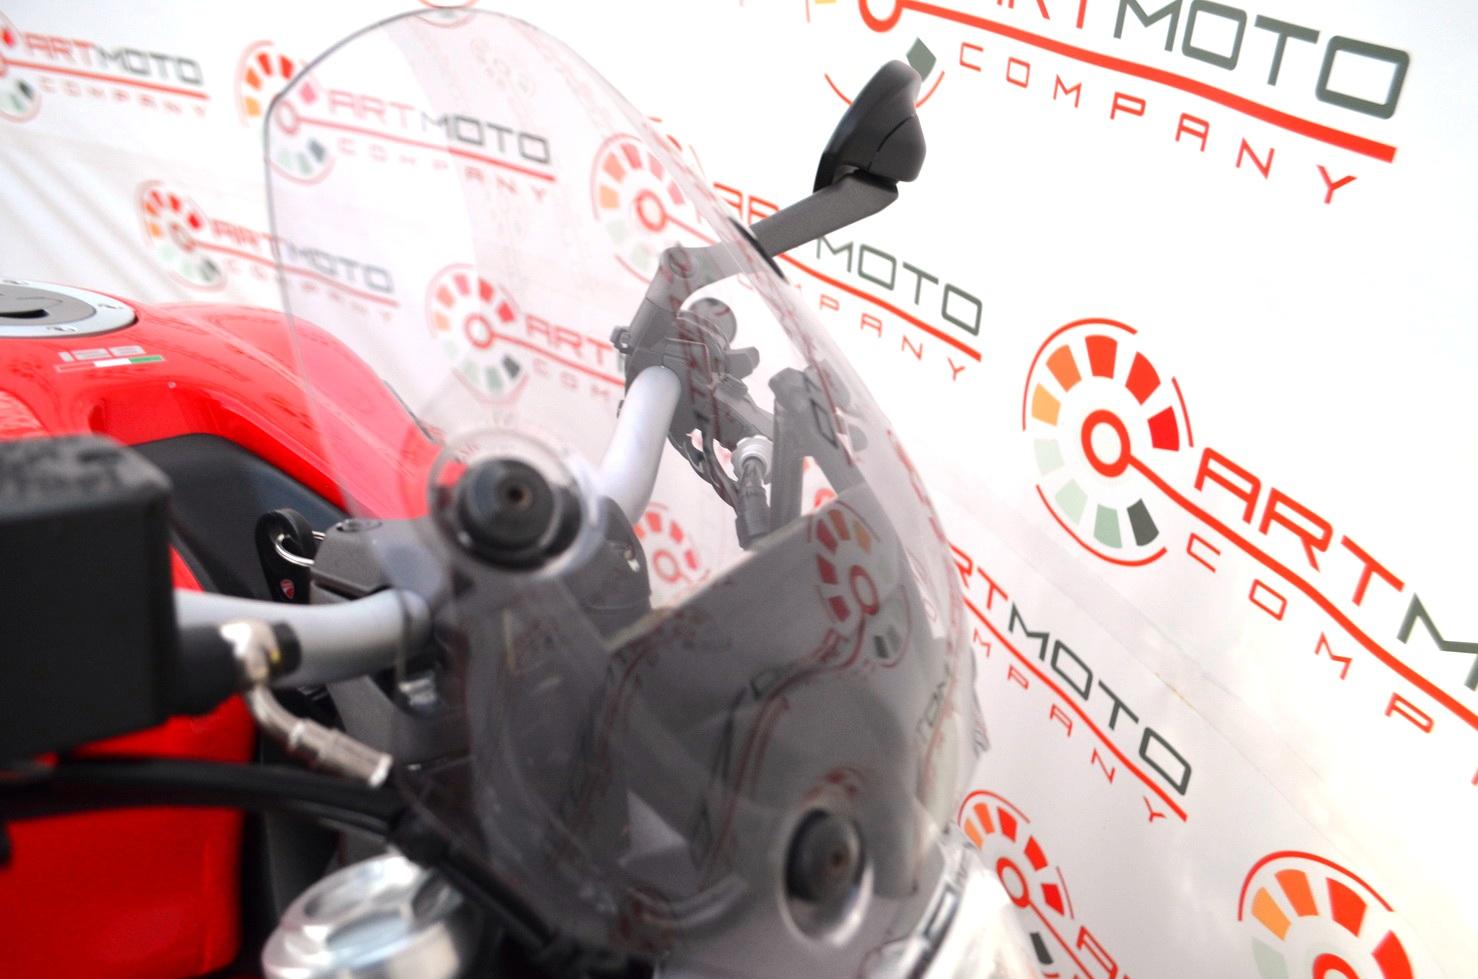 МОТОЦИКЛ DUCATI MONSTER 821 2016  Артмото - купить квадроцикл в украине и харькове, мотоцикл, снегоход, скутер, мопед, электромобиль